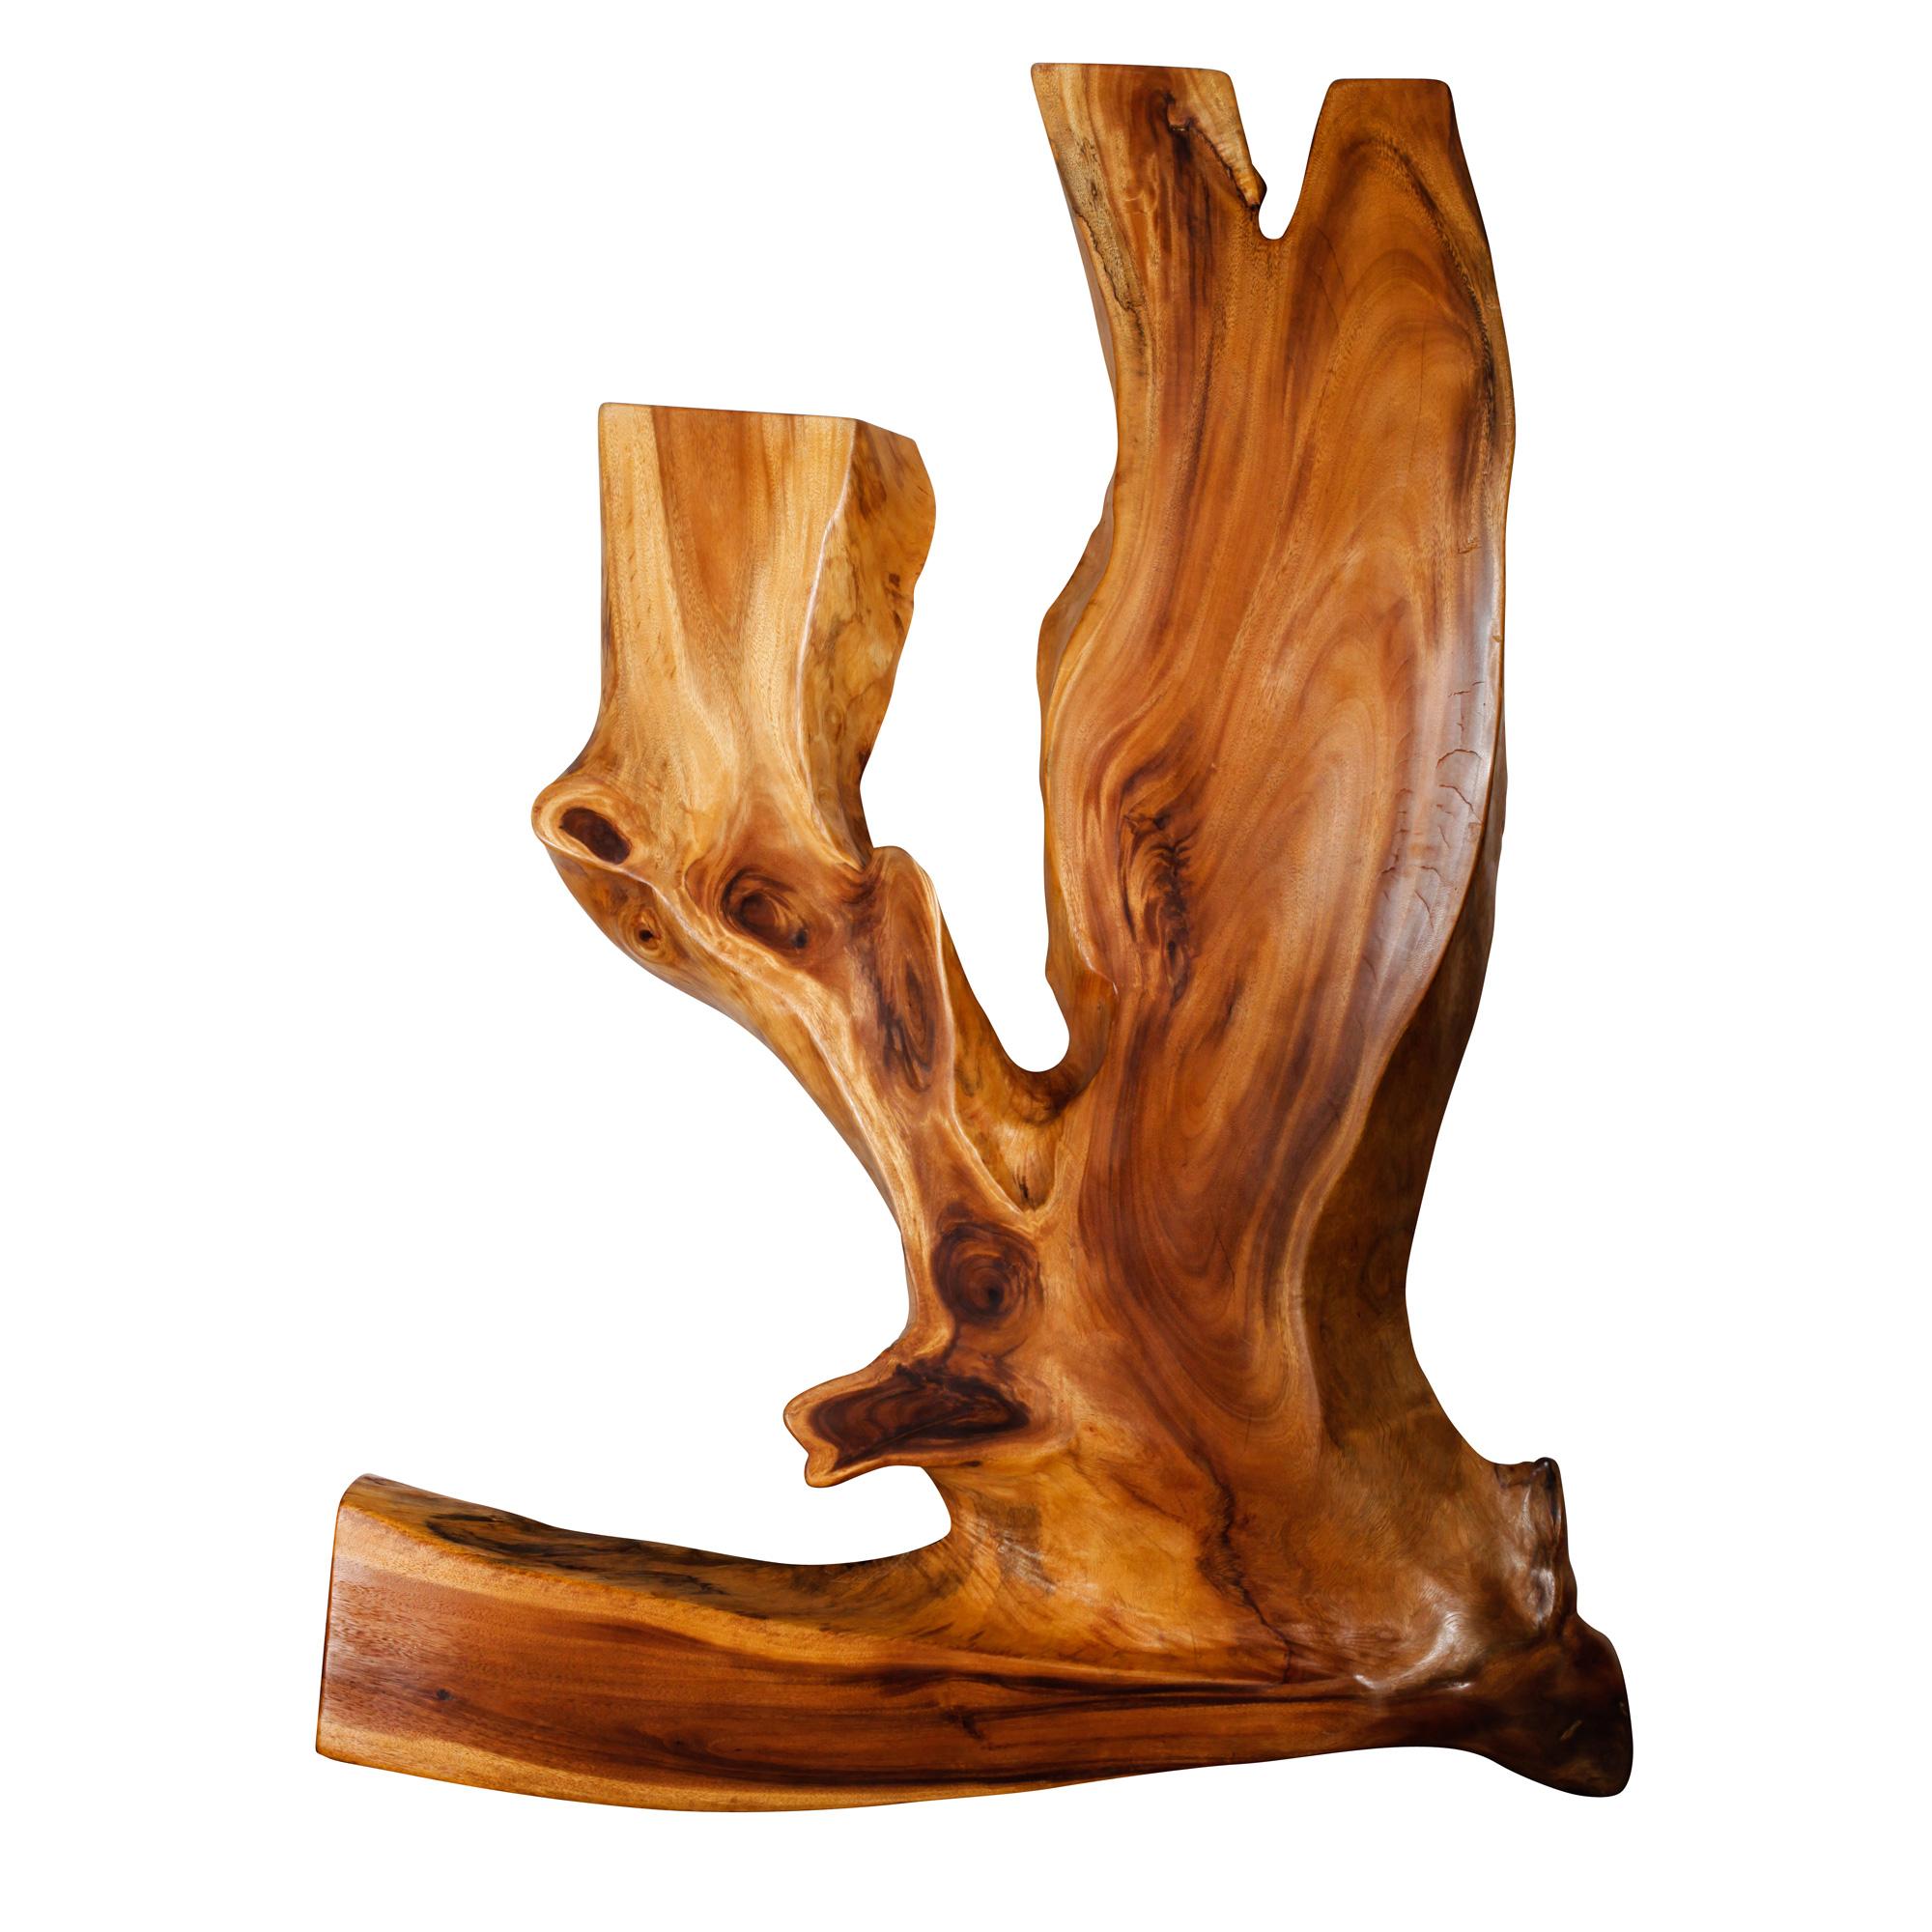 Saman Natural Wood Art - GR